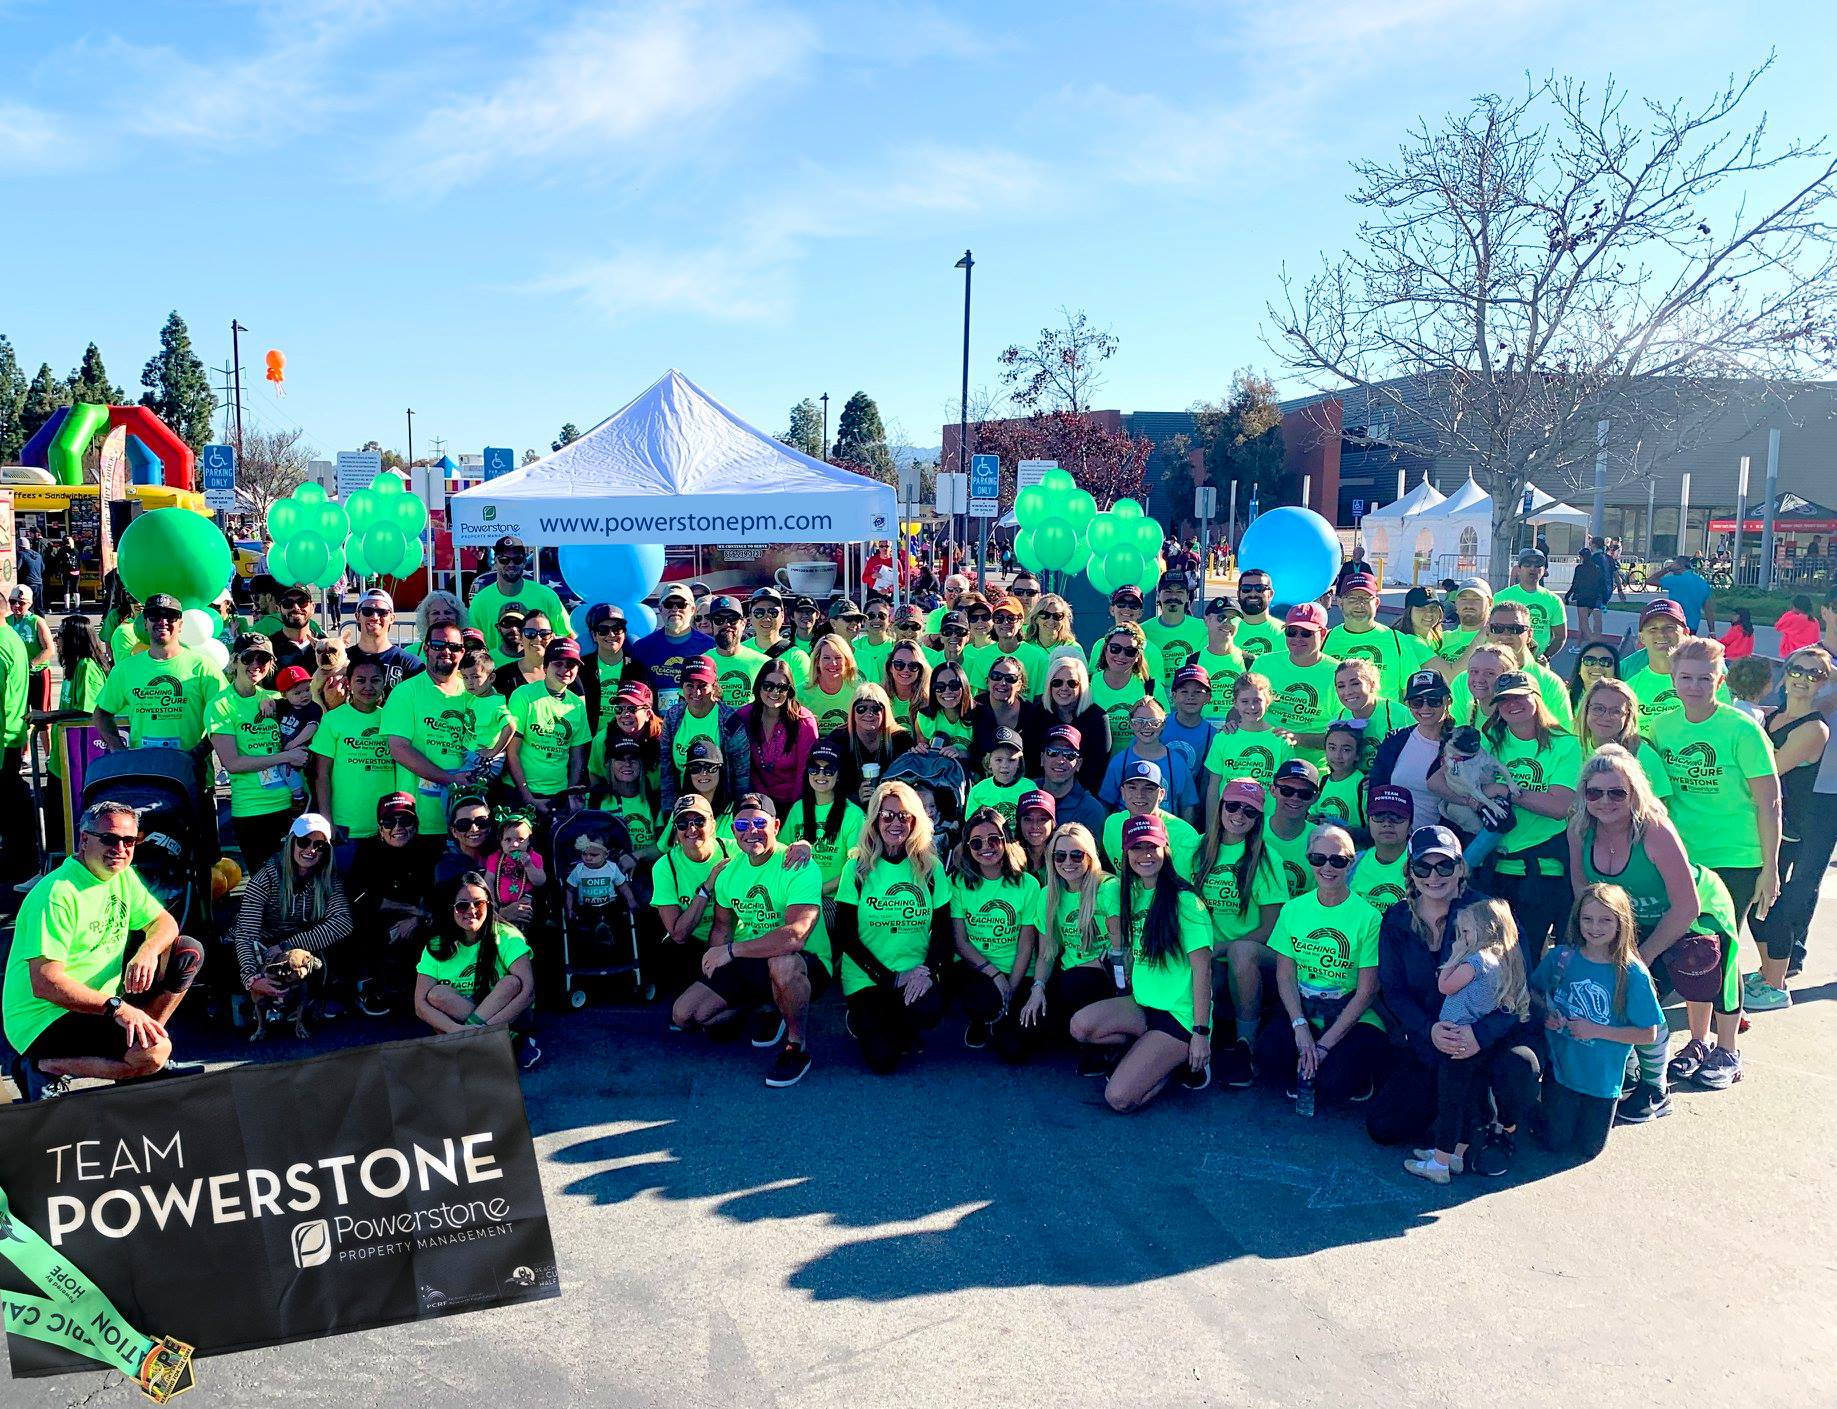 Powerstone raises $83,000 for kids cancer